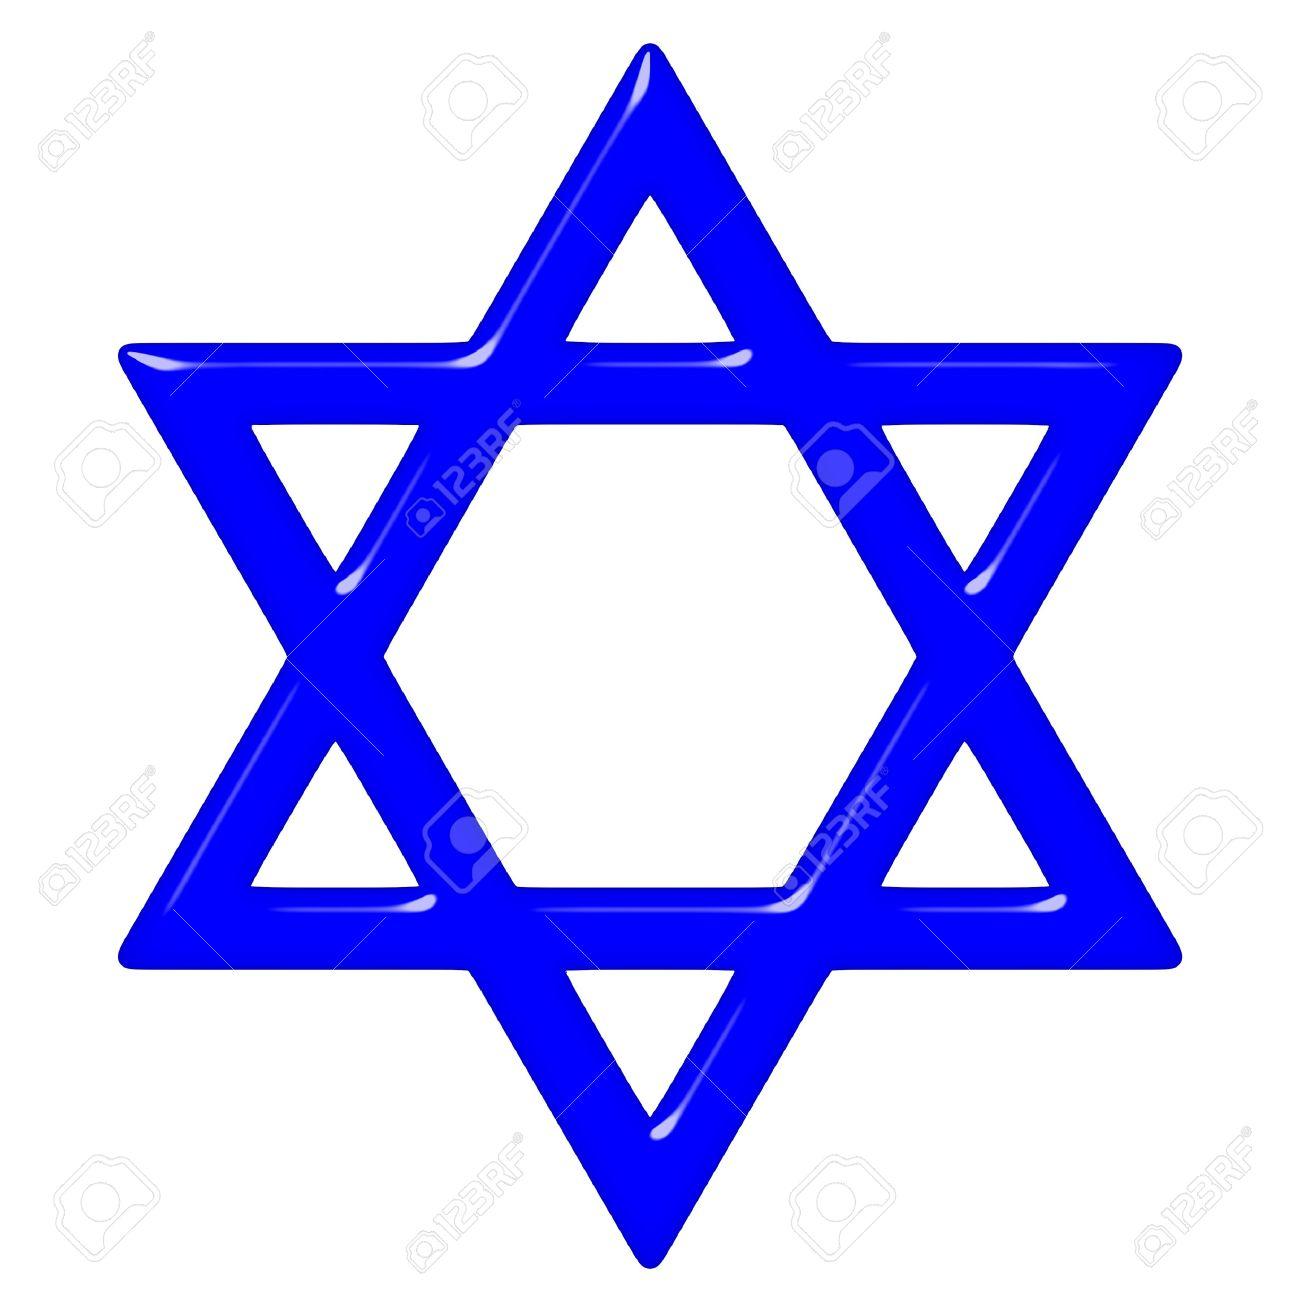 3d Star Of David Symbol Of Jewish Identity And Judaism Stock Photo